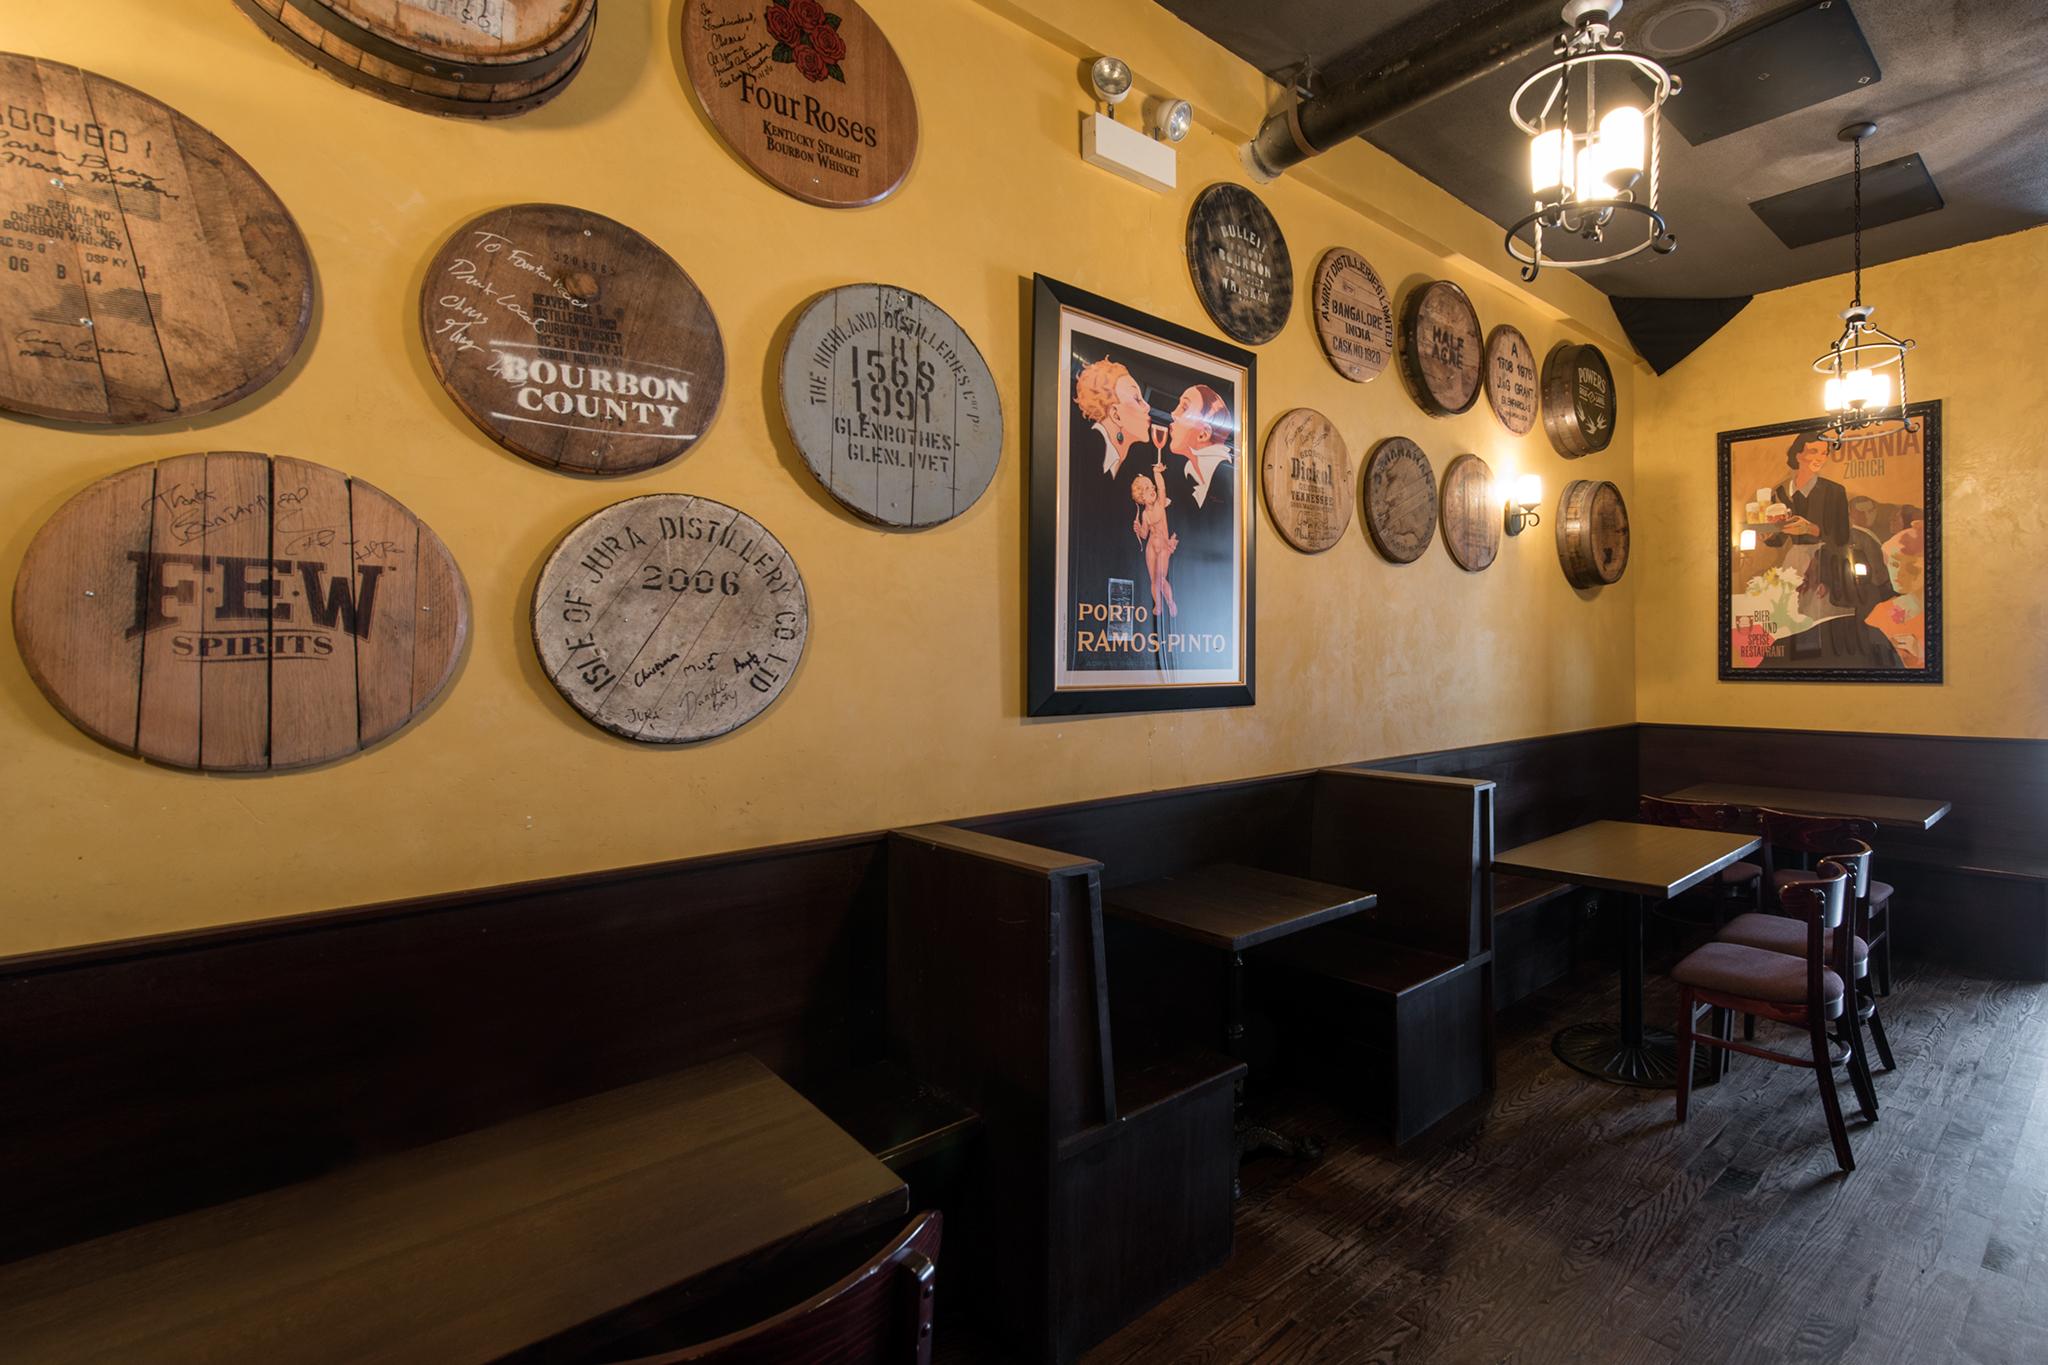 Fountainhead Barrel Room